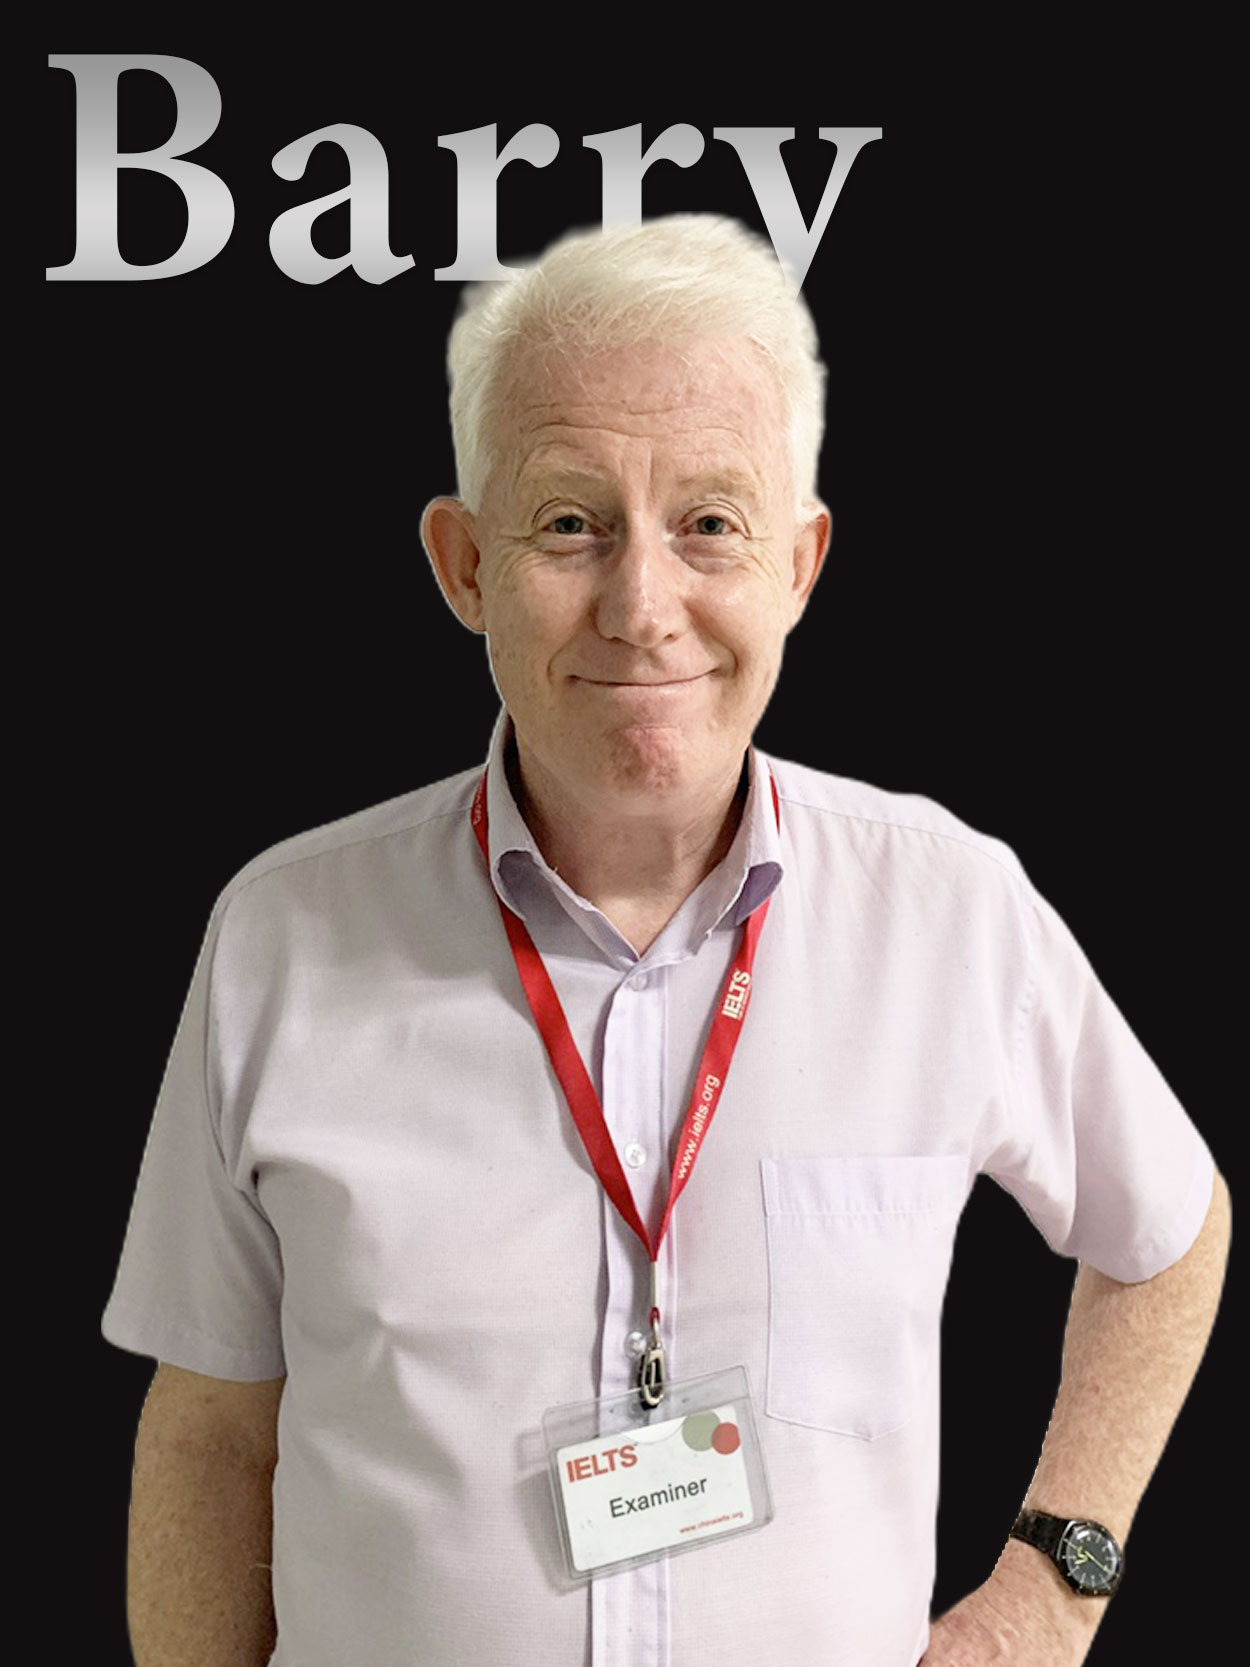 Barry1